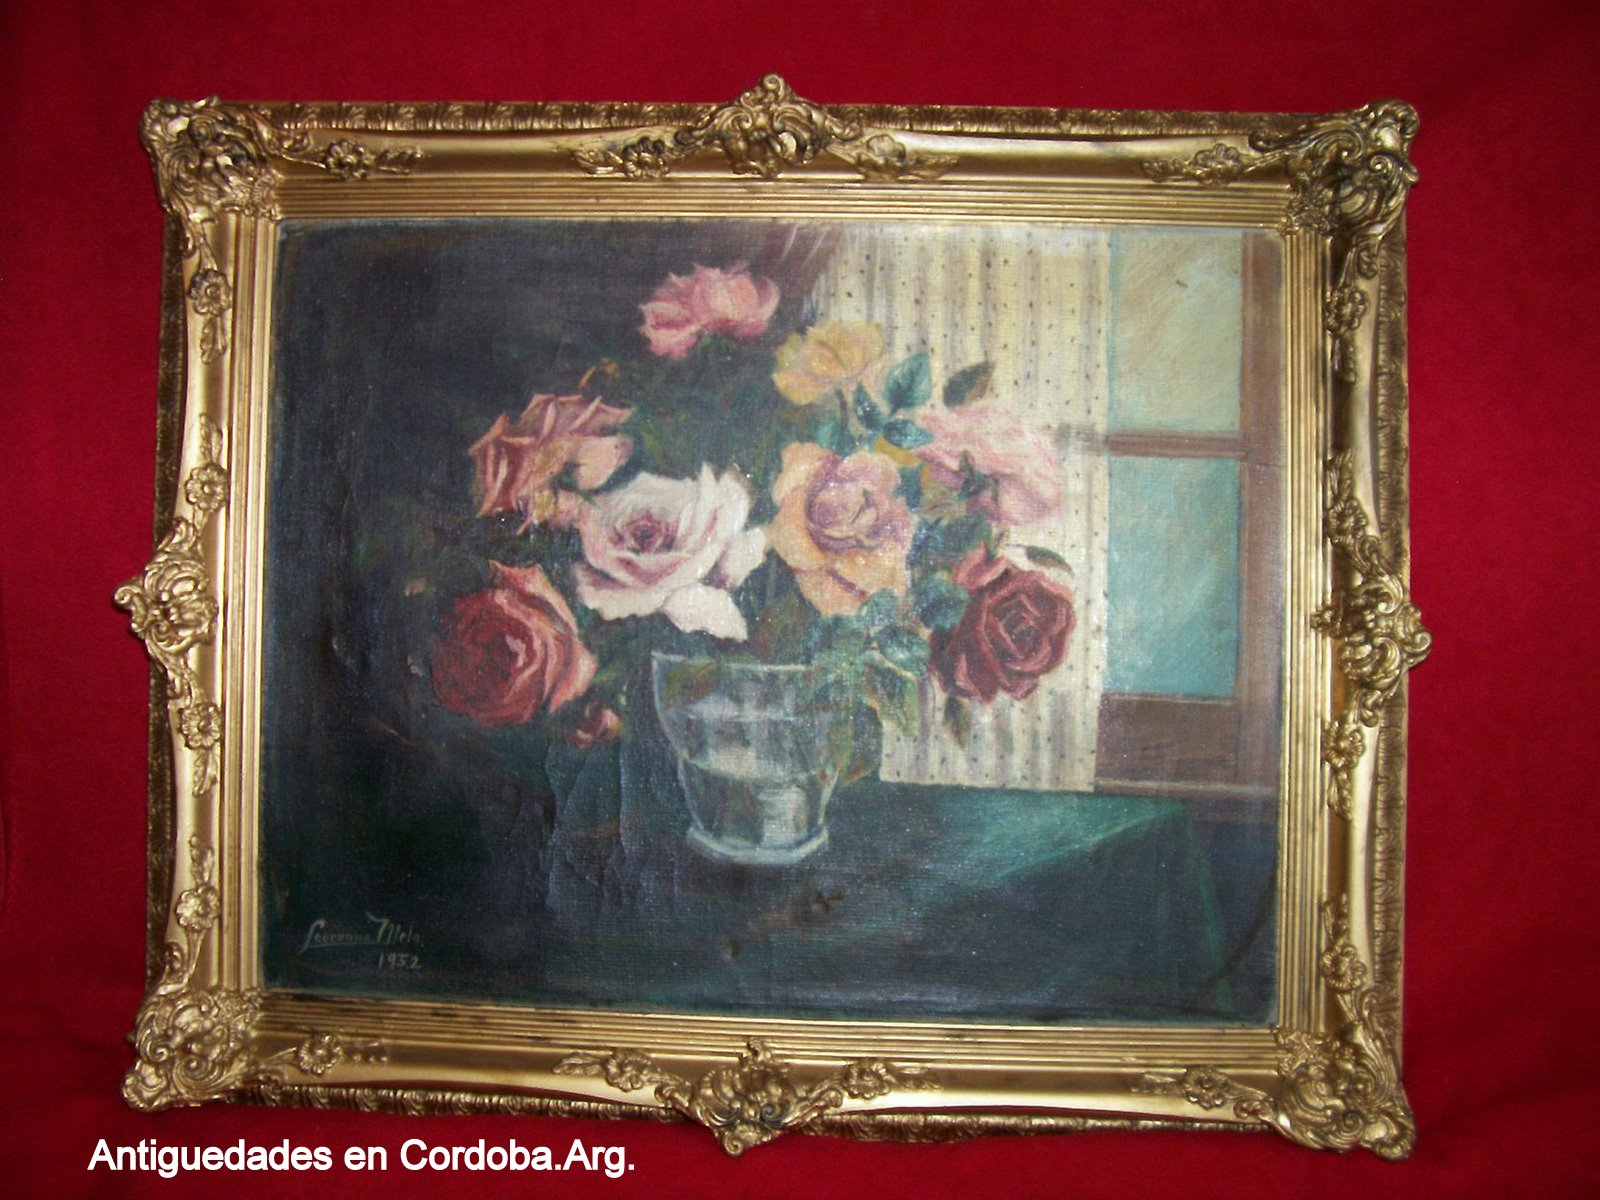 Antiguedades en cordoba argentina antiguedades cuadros oleo - Muebles antiguos cordoba ...